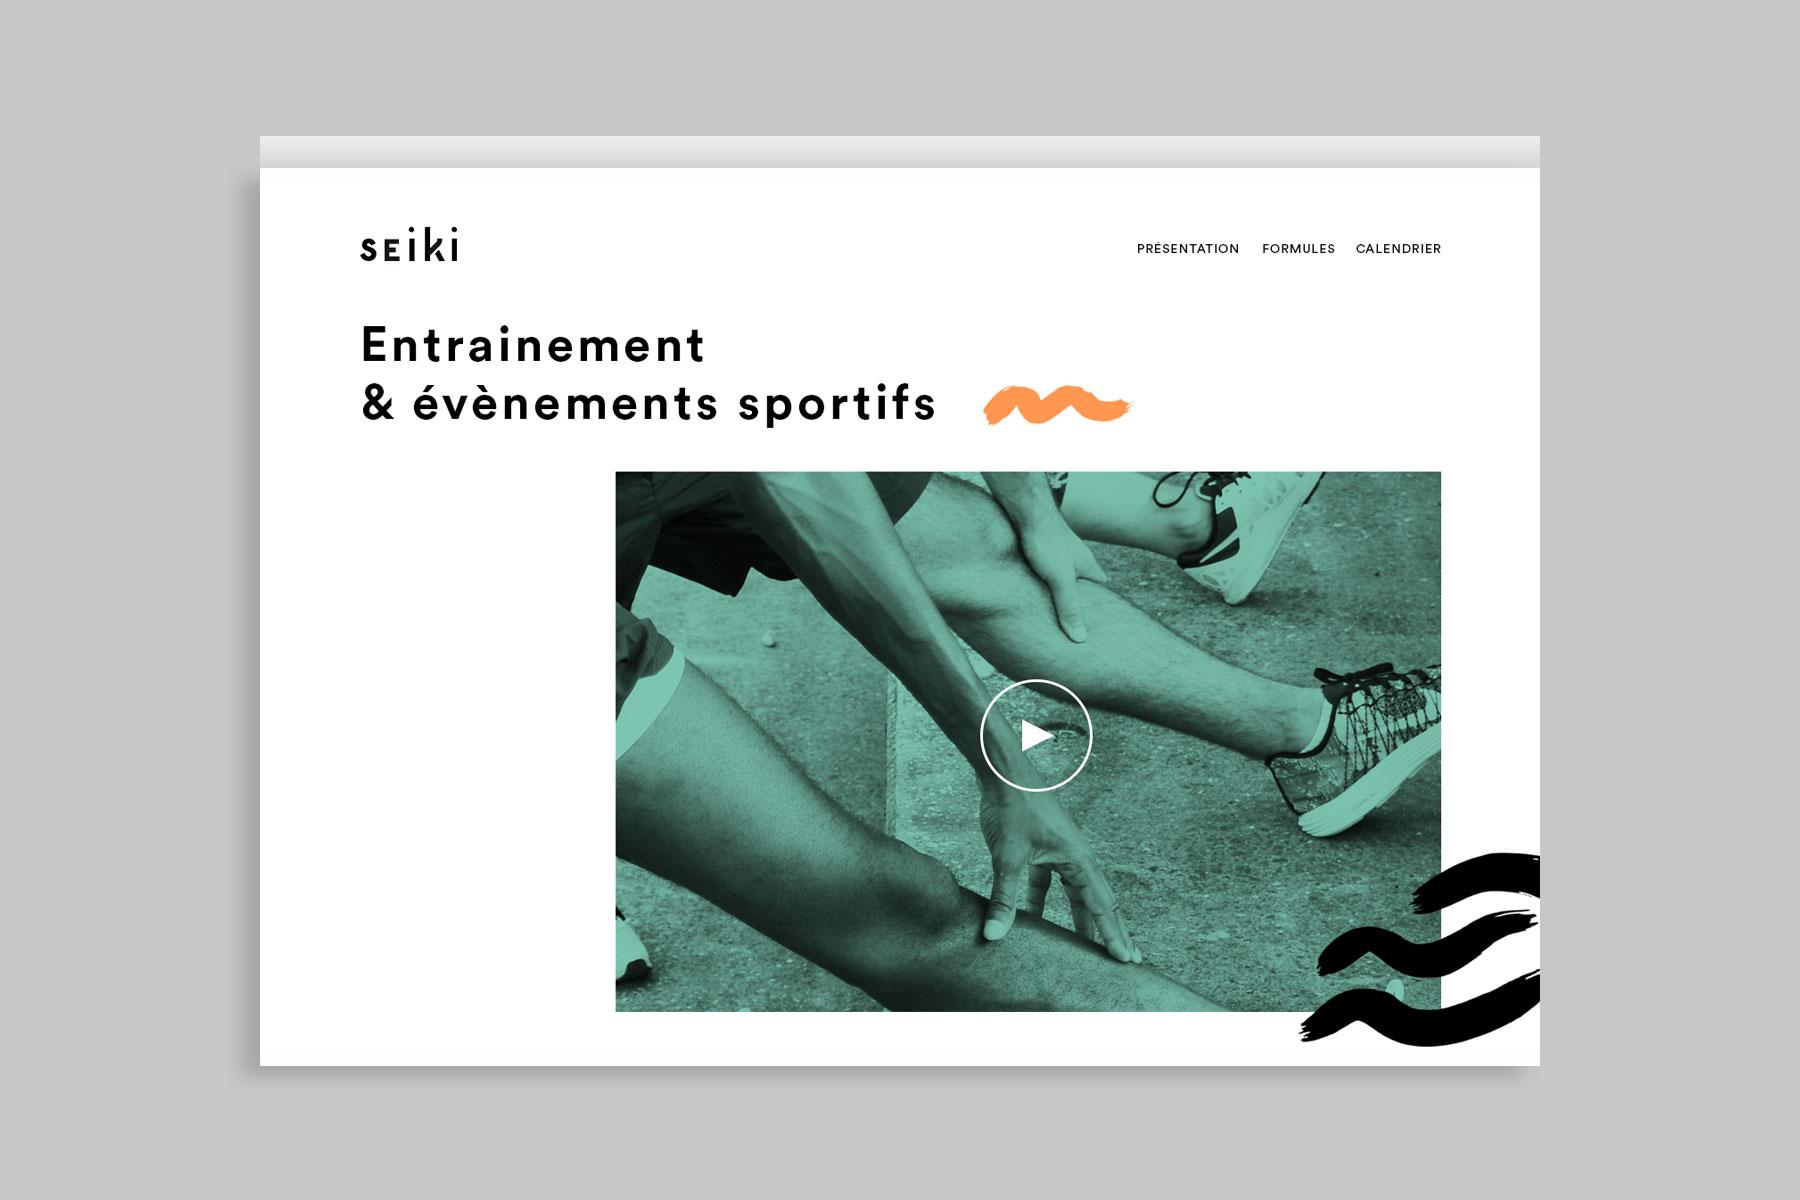 seiki_site01